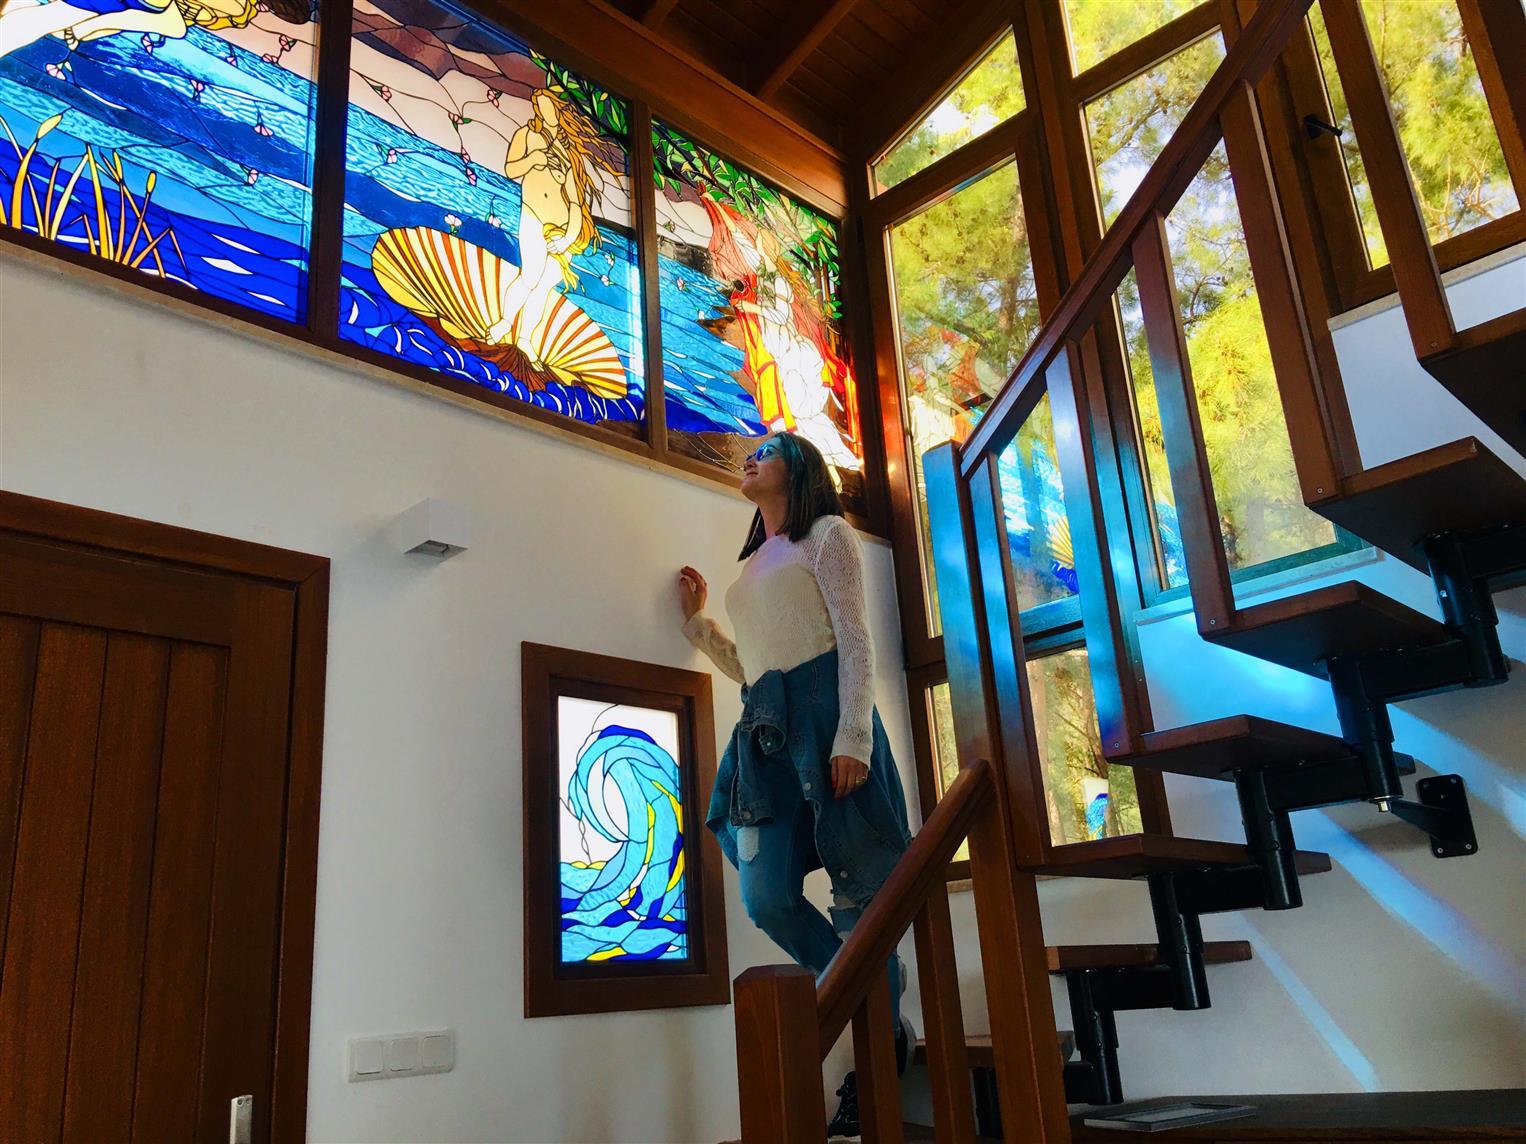 venusun-dogusu-sandro-botticelli-vitray-uyarlamasi-datca-mugla-villa2020120162323816.jpg izmir vitray çalışması